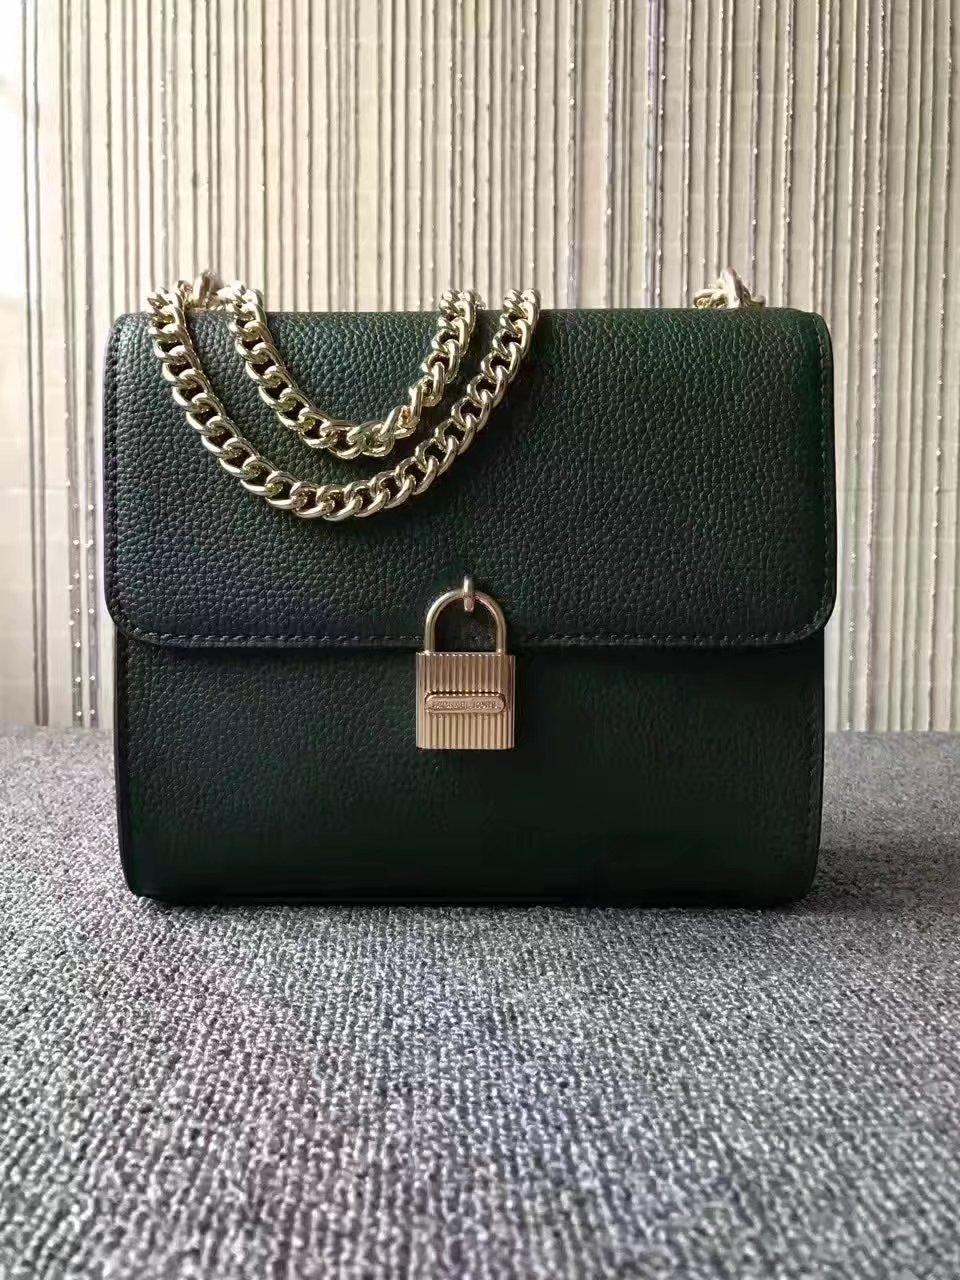 Michael Kors 2017 Lock Shoulder Chain Bag Green